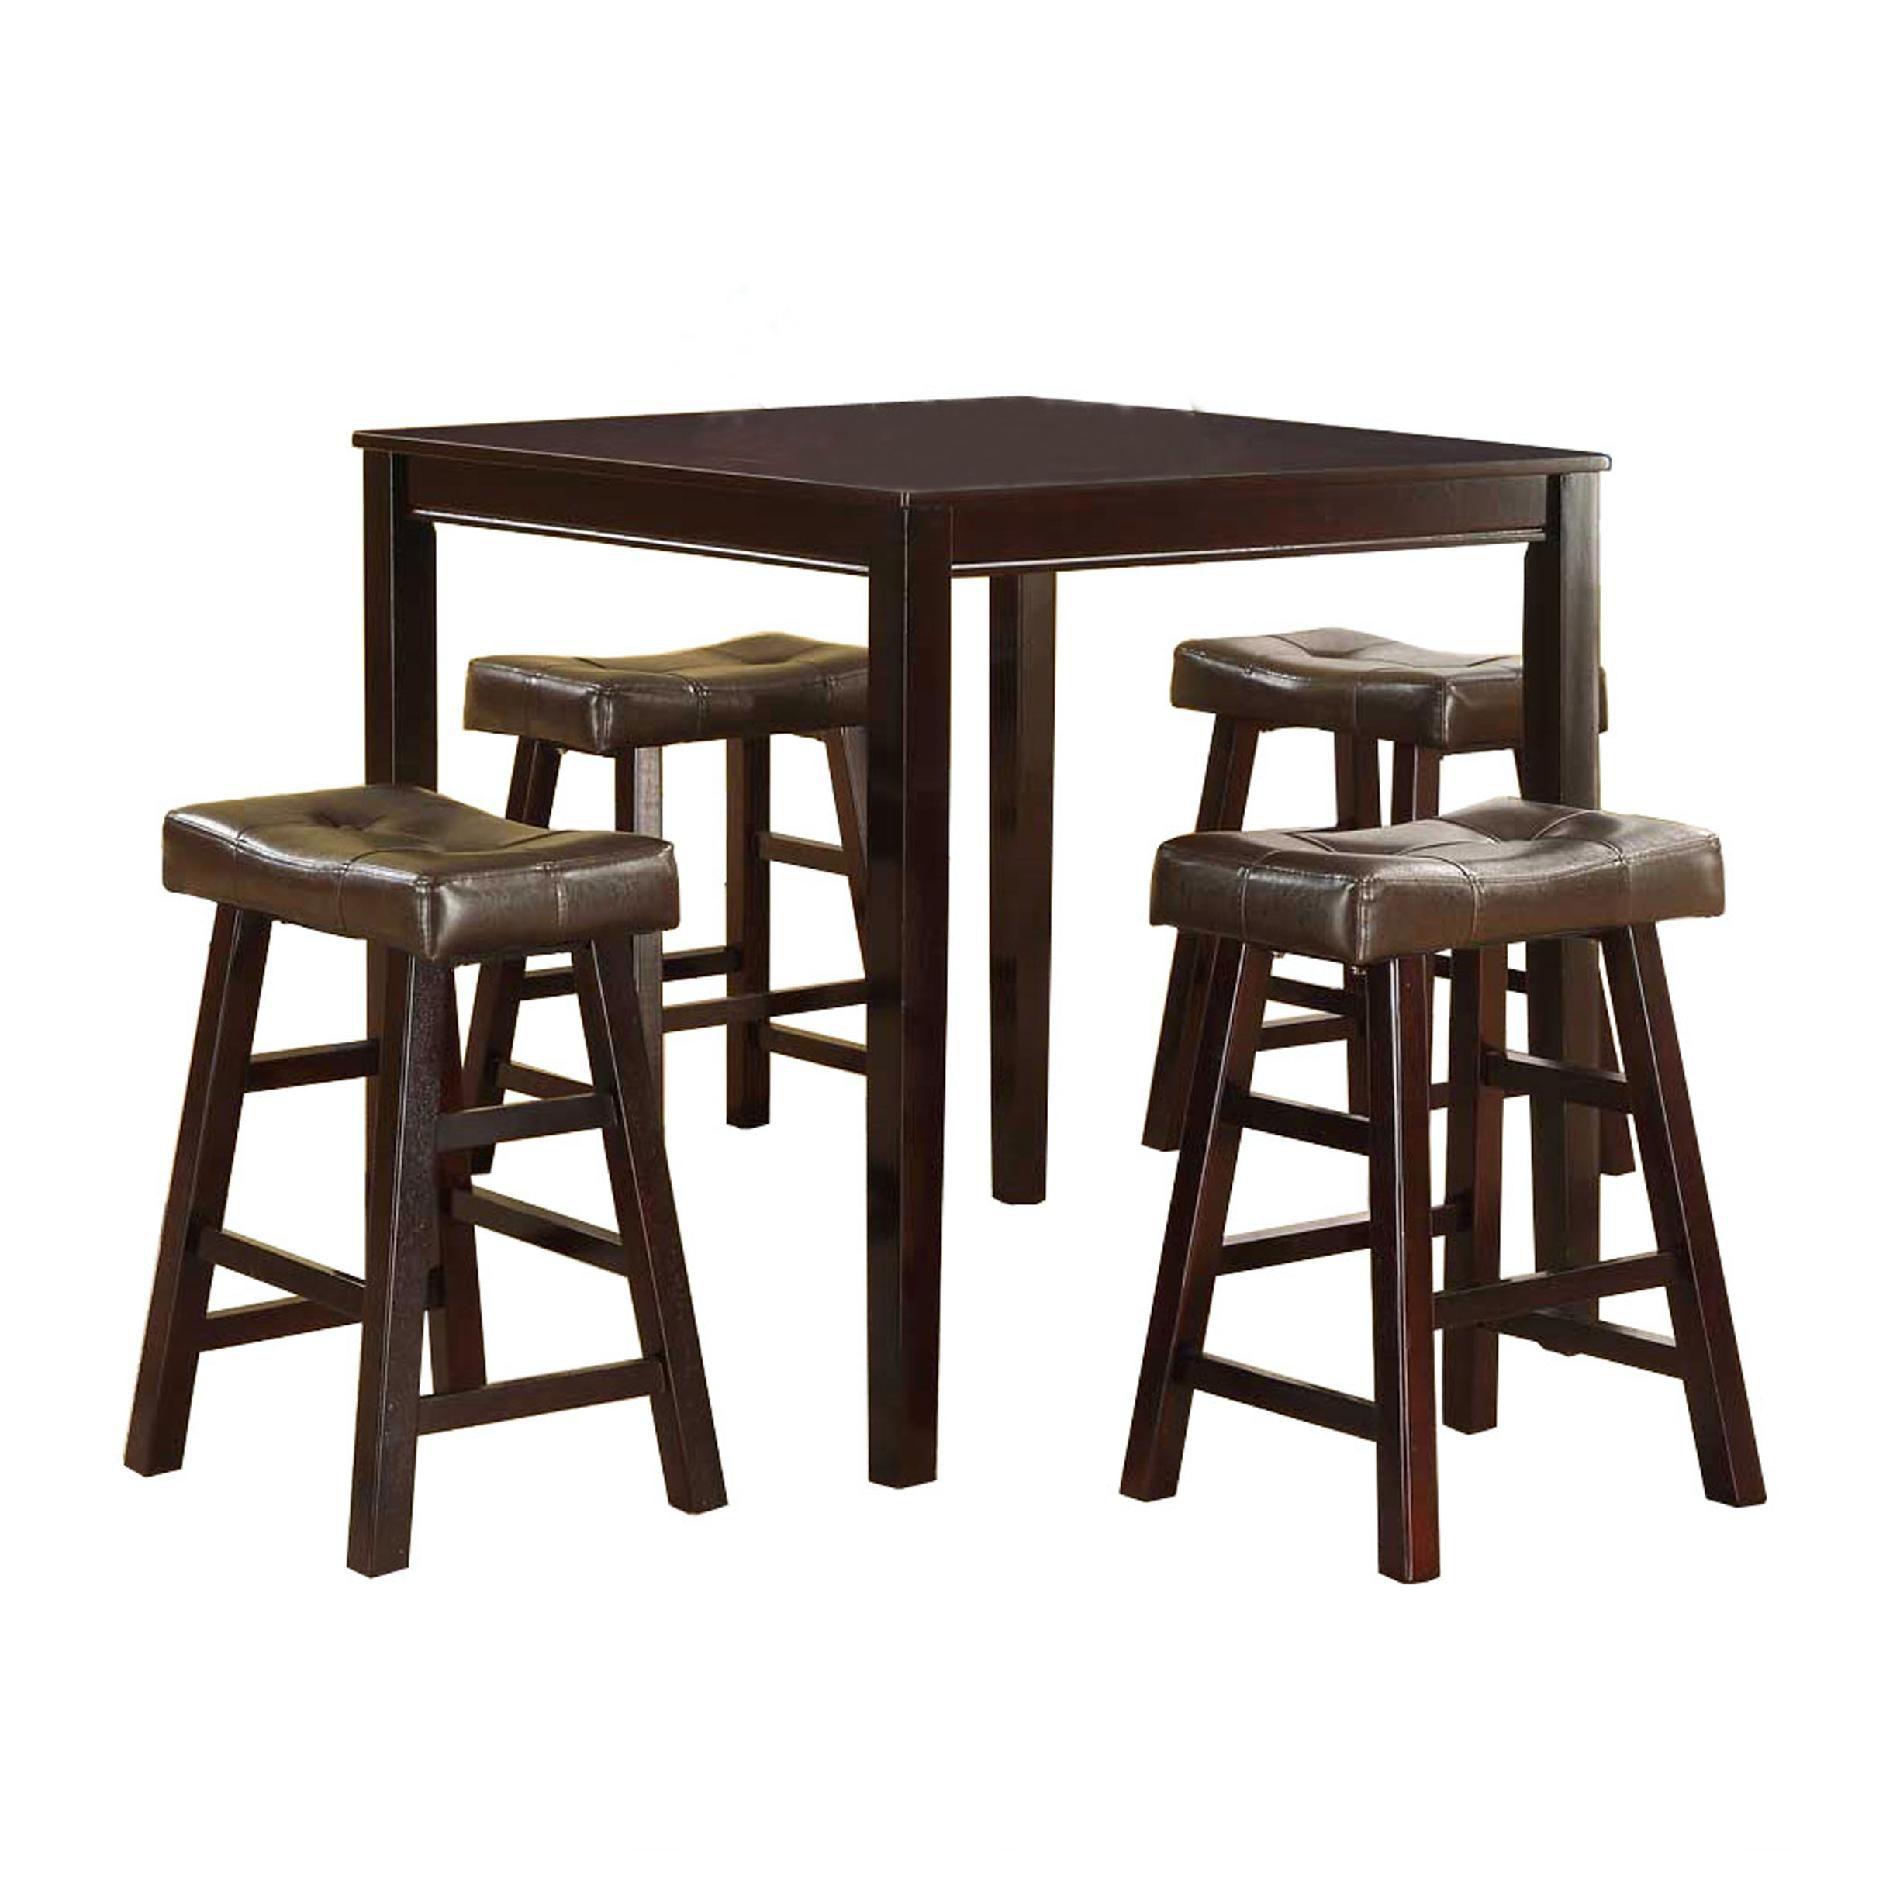 5pc Saddle Pub Set with Tufted Seats